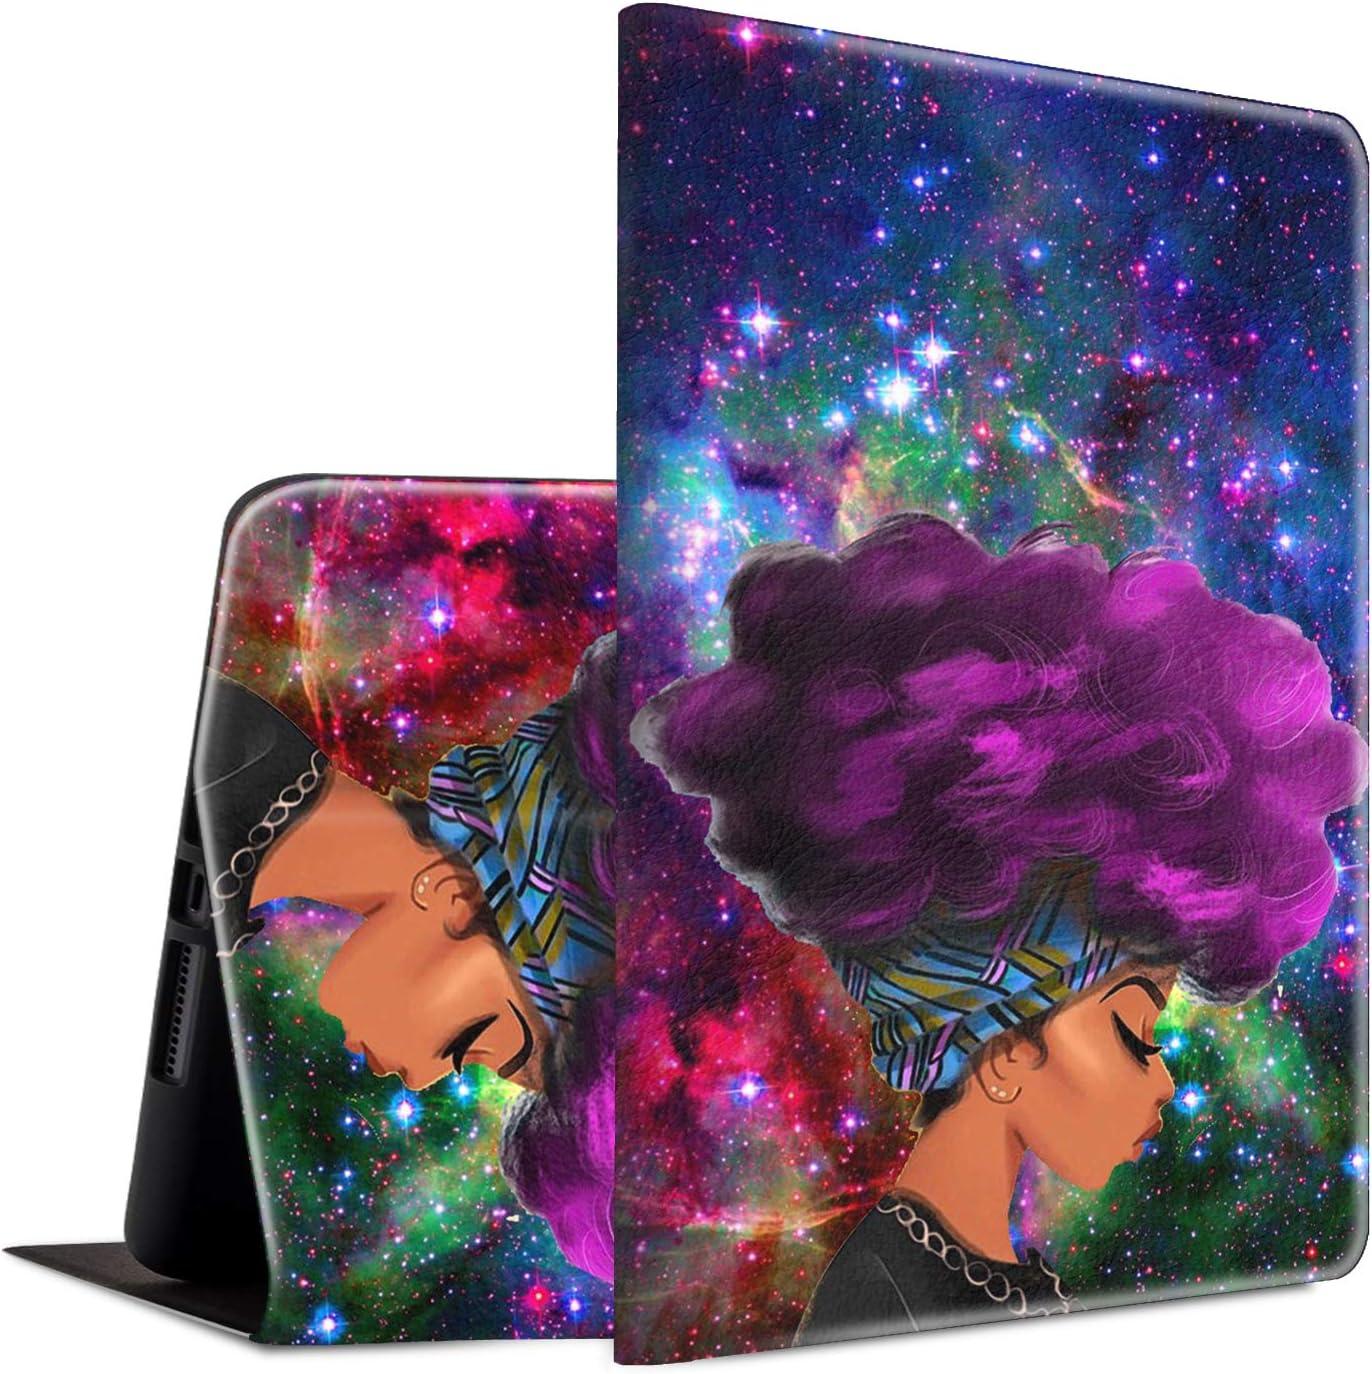 iPad Charlotte Mall 9.7 2018 2017 Case Lightw Spsun Air 2 Special price